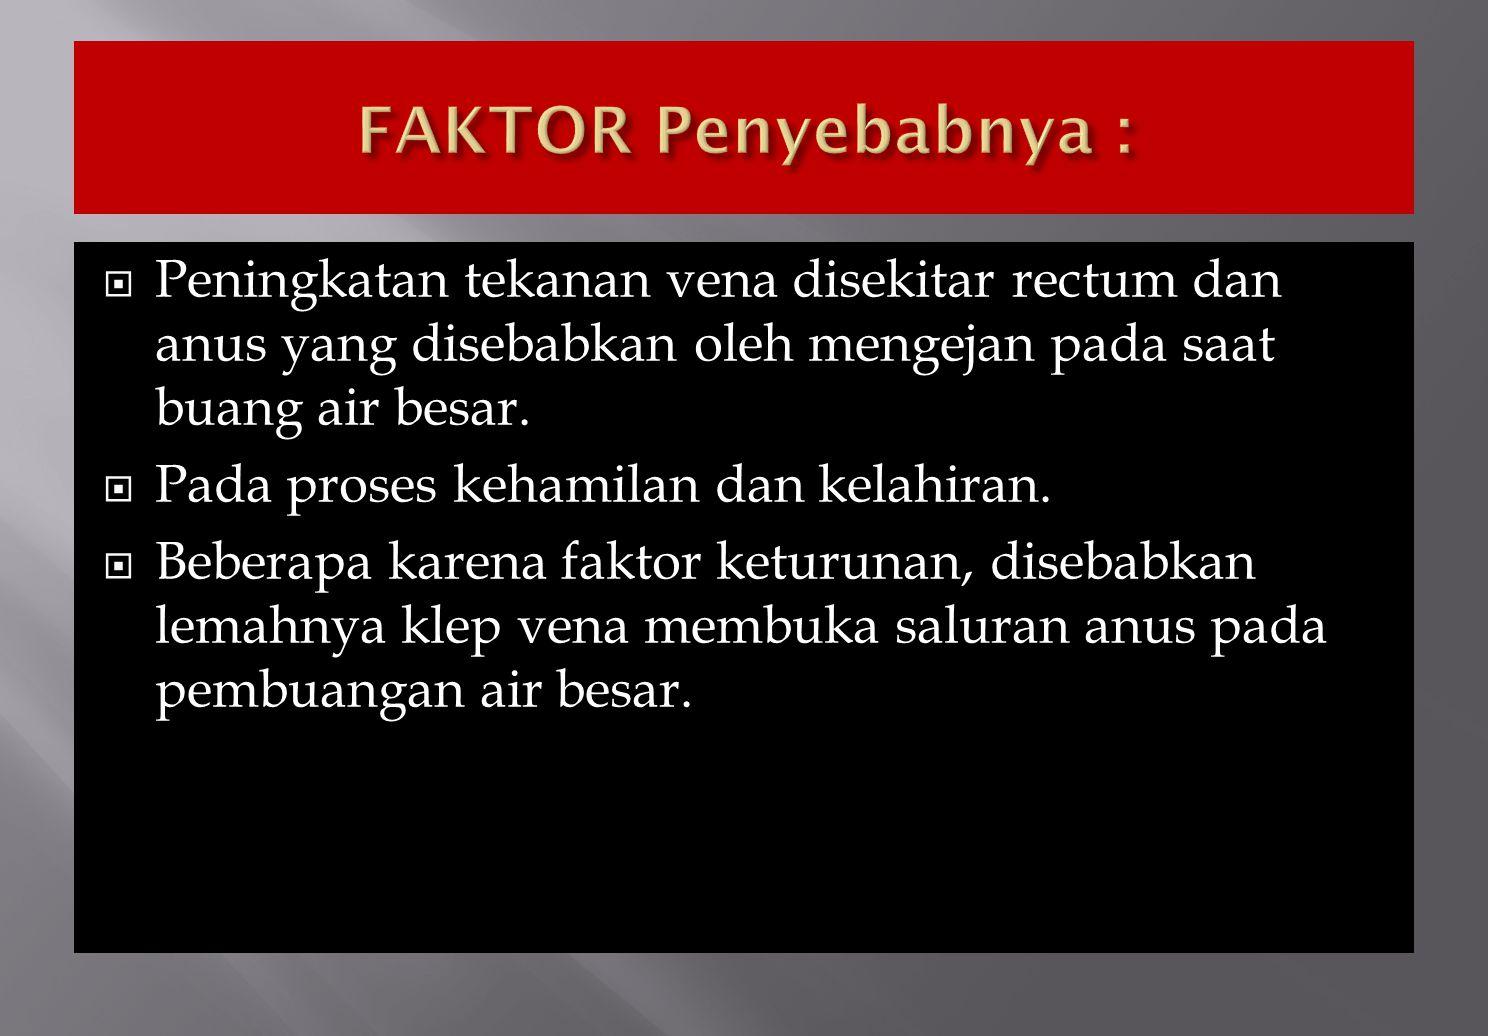 FAKTOR Penyebabnya : Peningkatan tekanan vena disekitar rectum dan anus yang disebabkan oleh mengejan pada saat buang air besar.